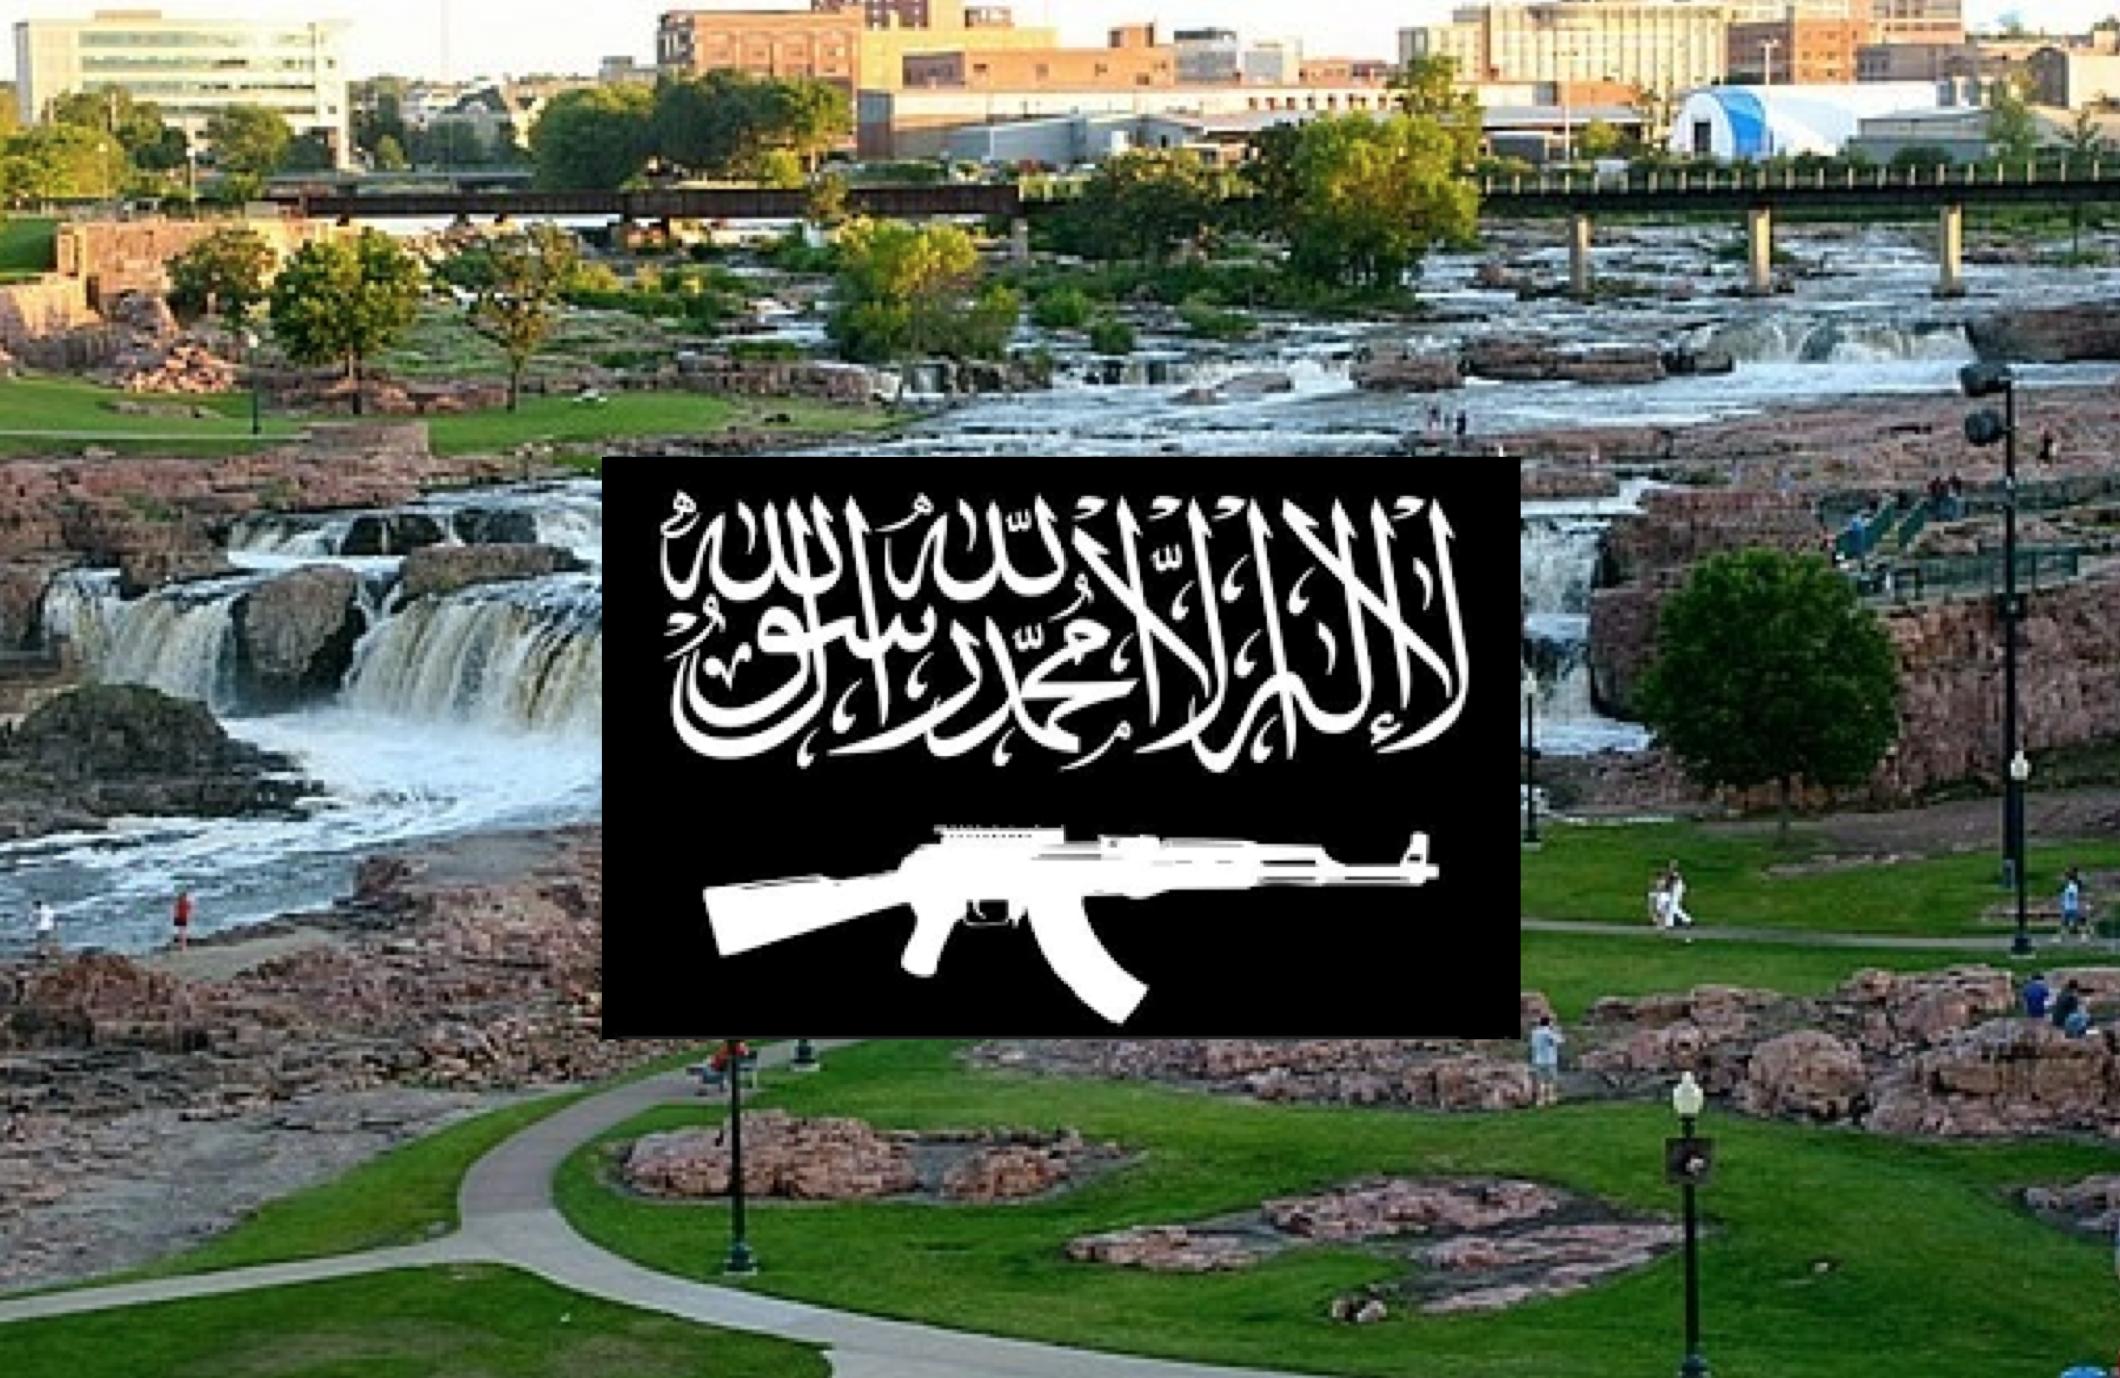 Muslims in south dakota